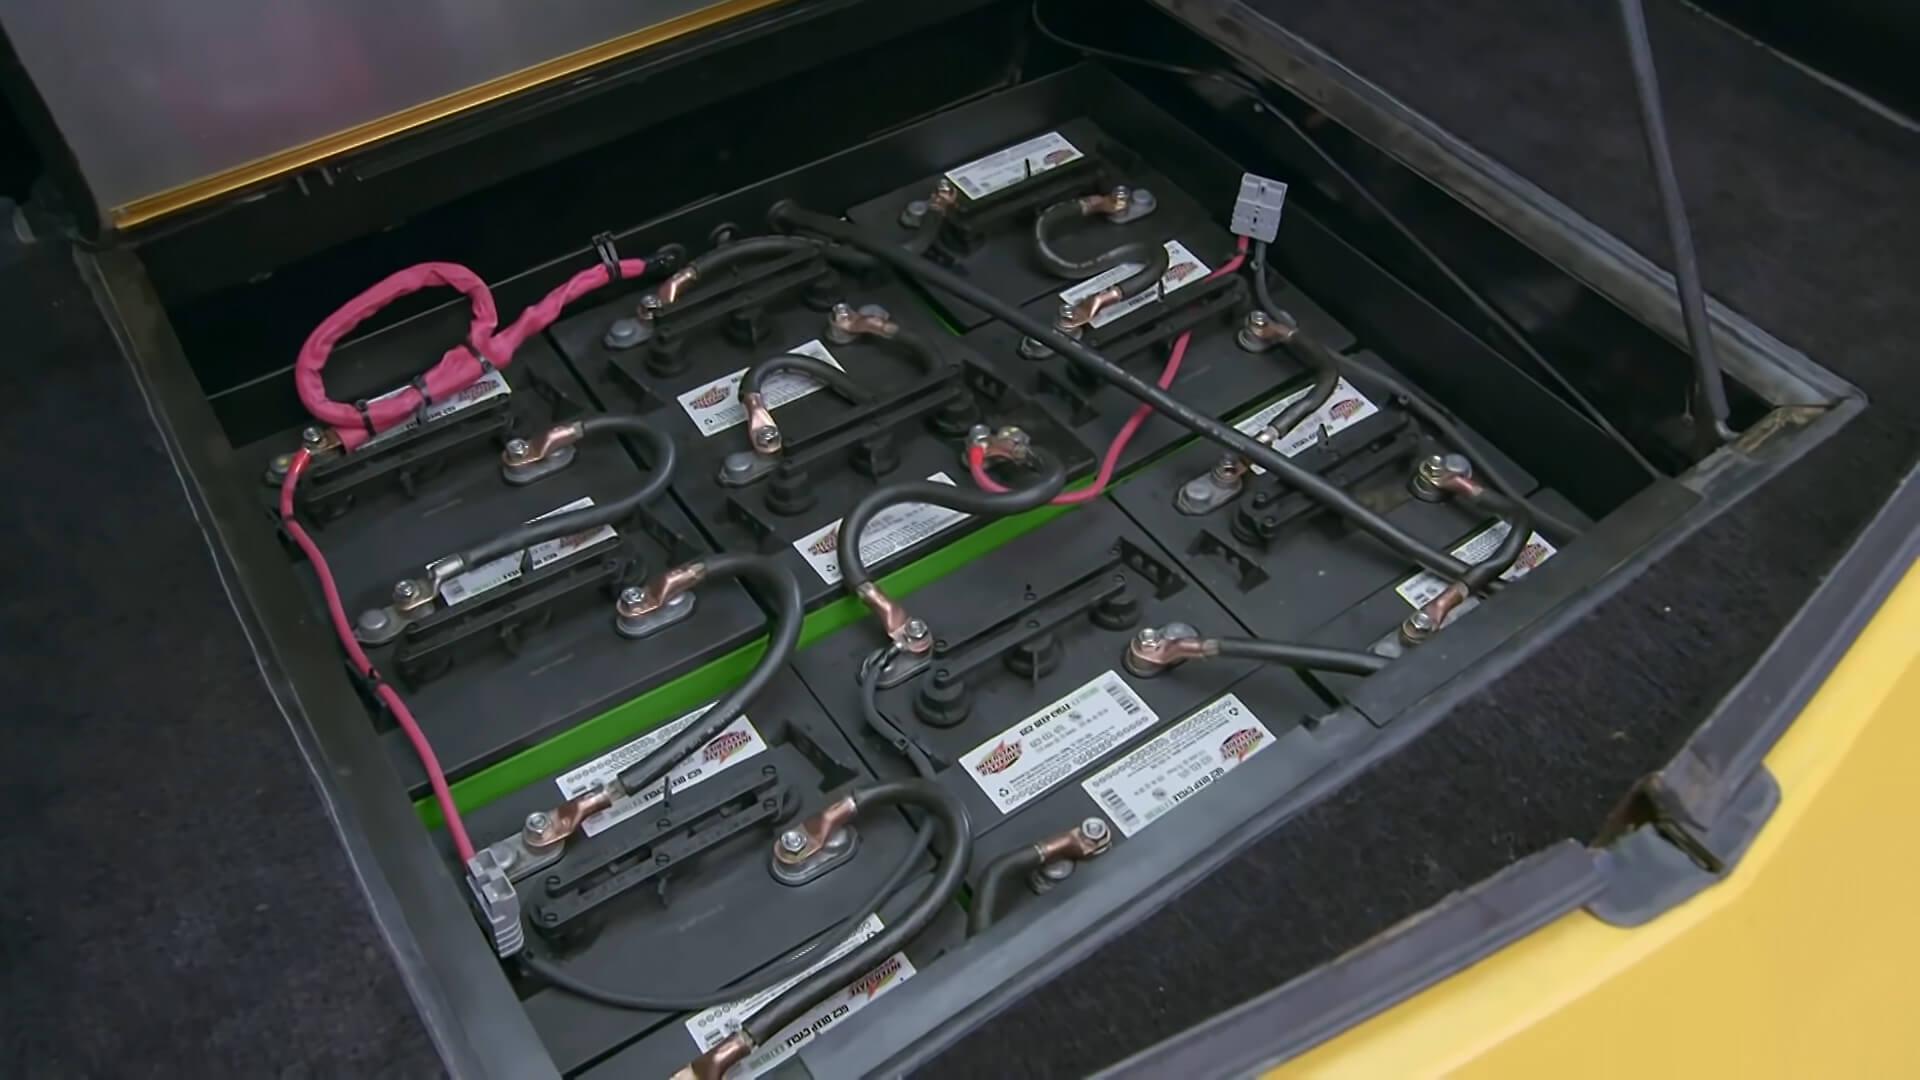 Свинцово-кислотные аккумуляторы Briggs & Stratton Hybrid обеспечивали запас хода до 100 км